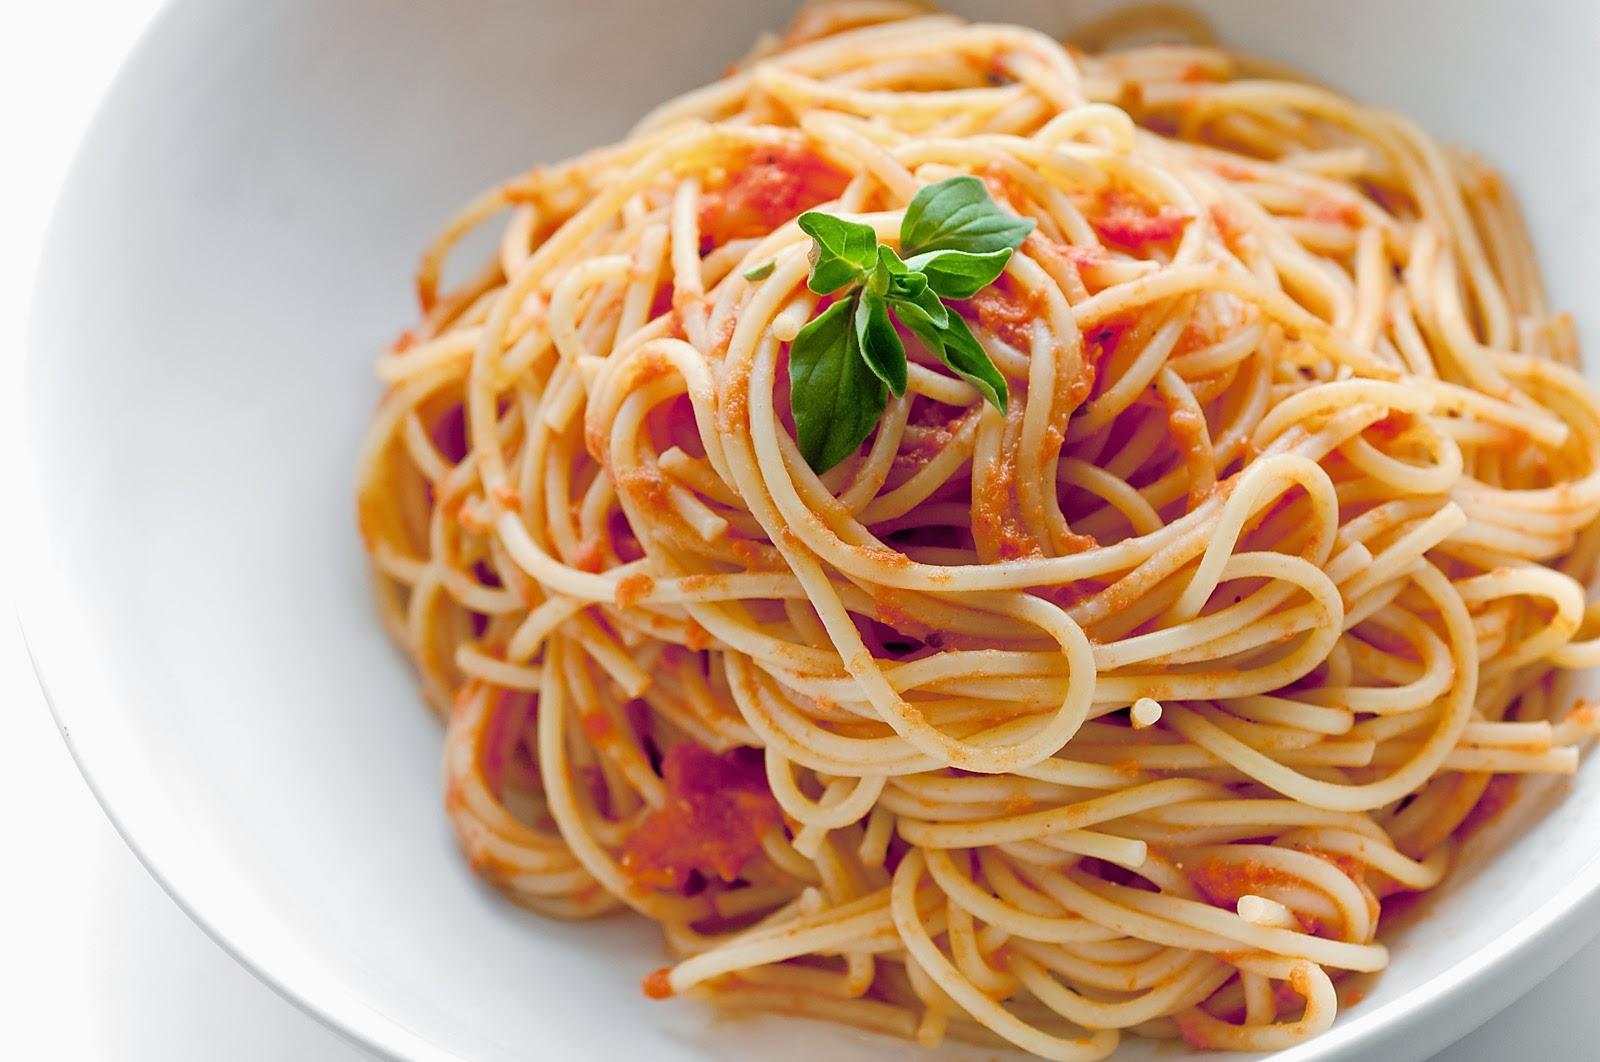 Spaghetti O S With Hot Dogs